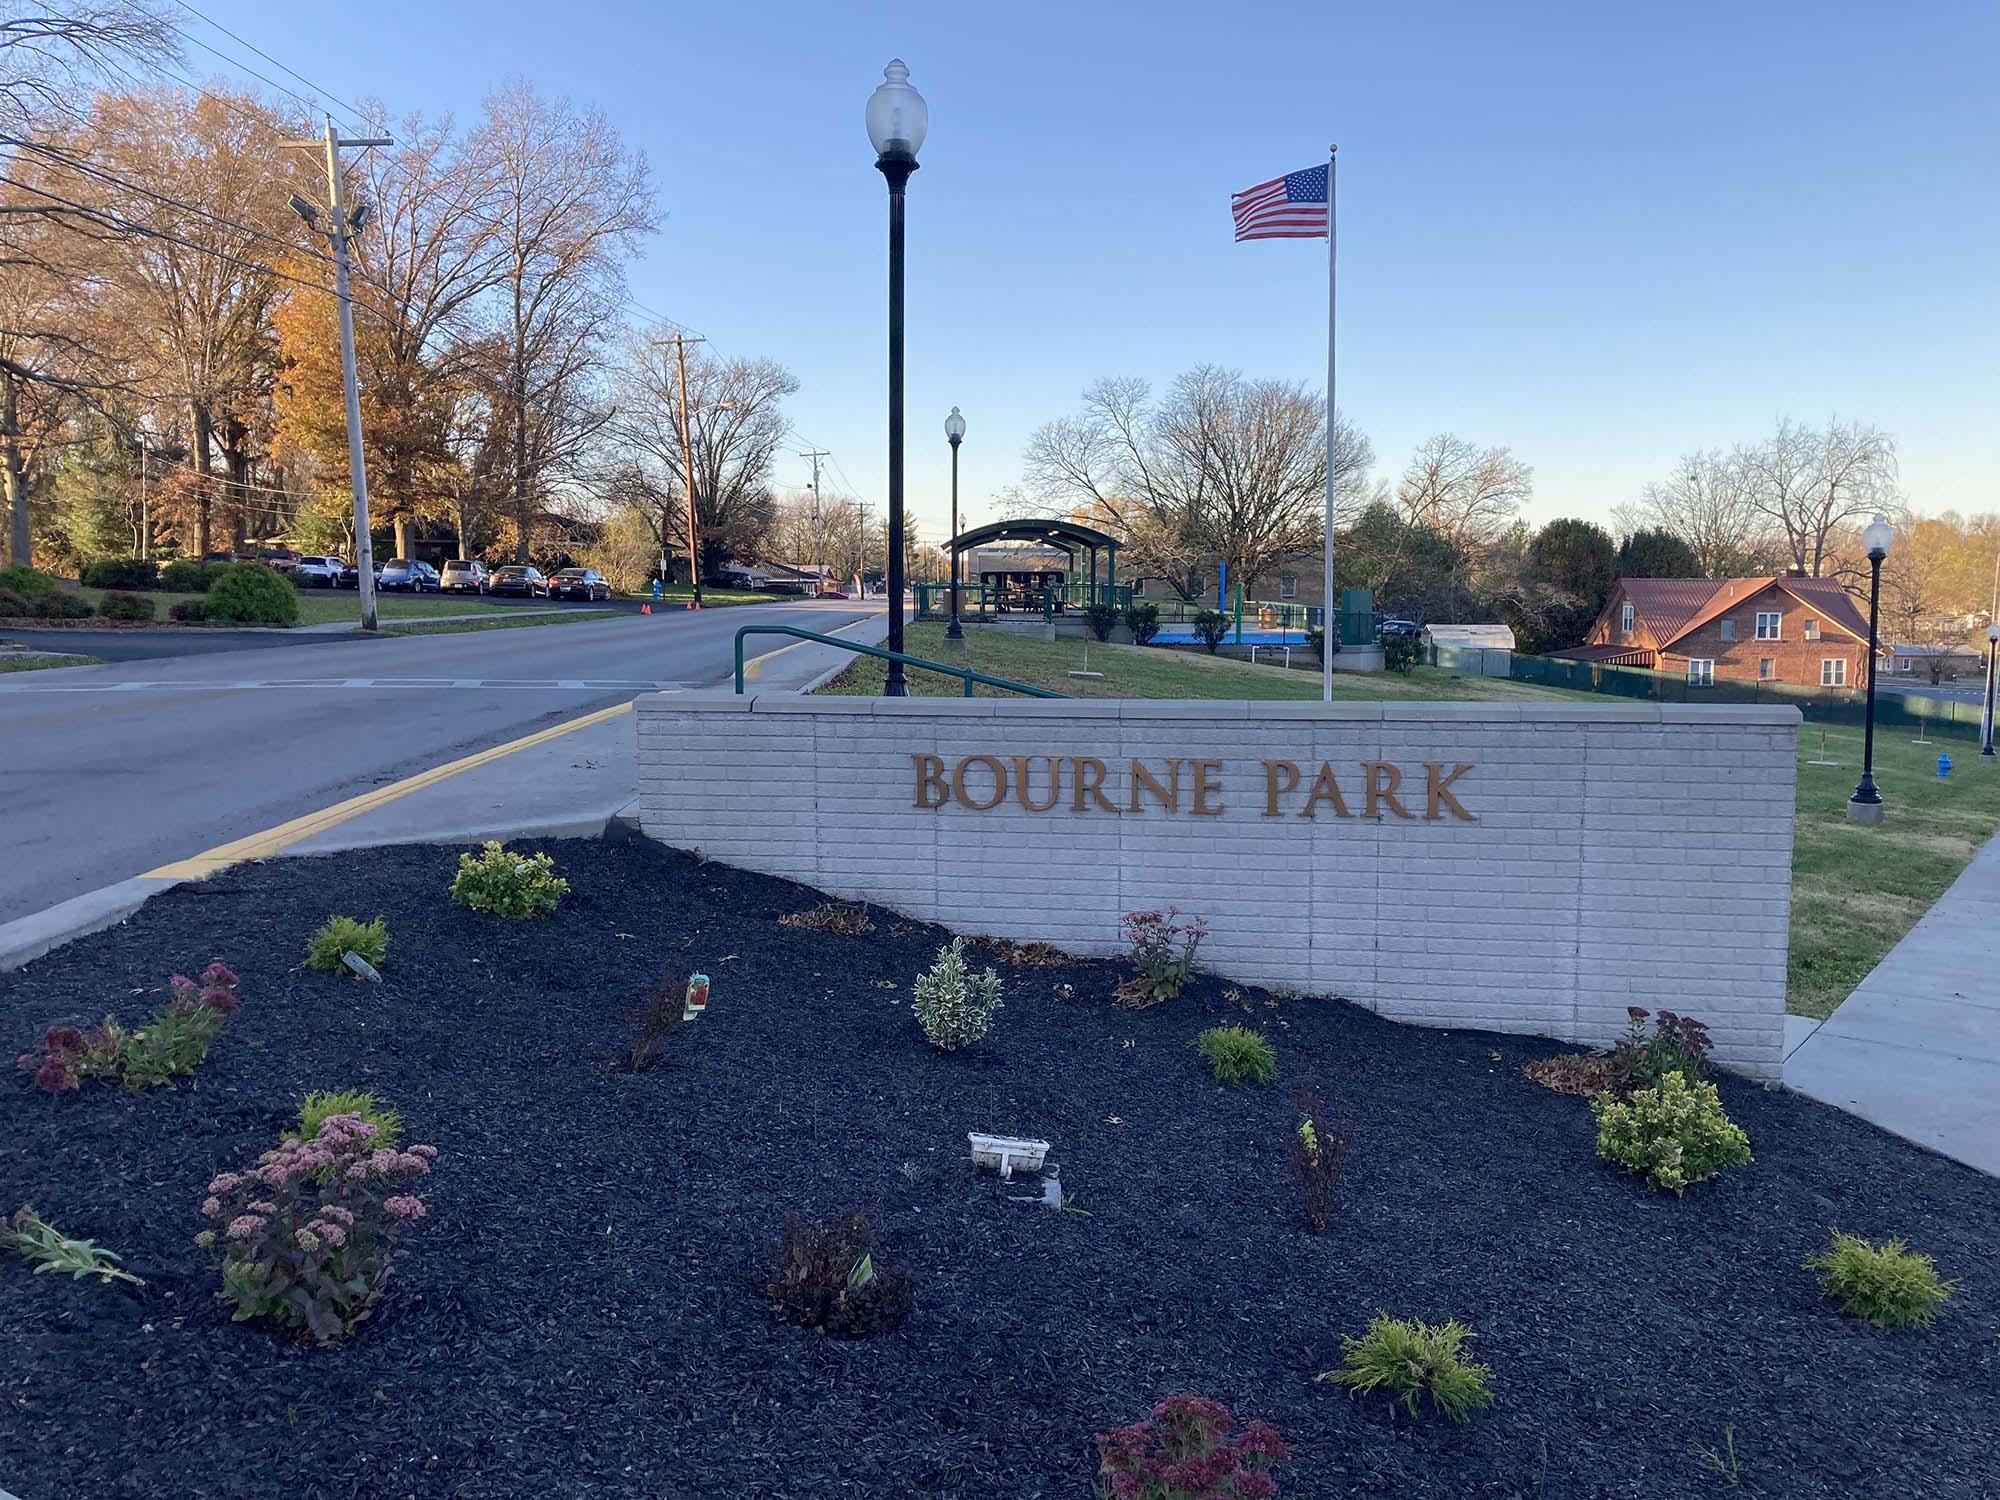 Bourne Park Scaled